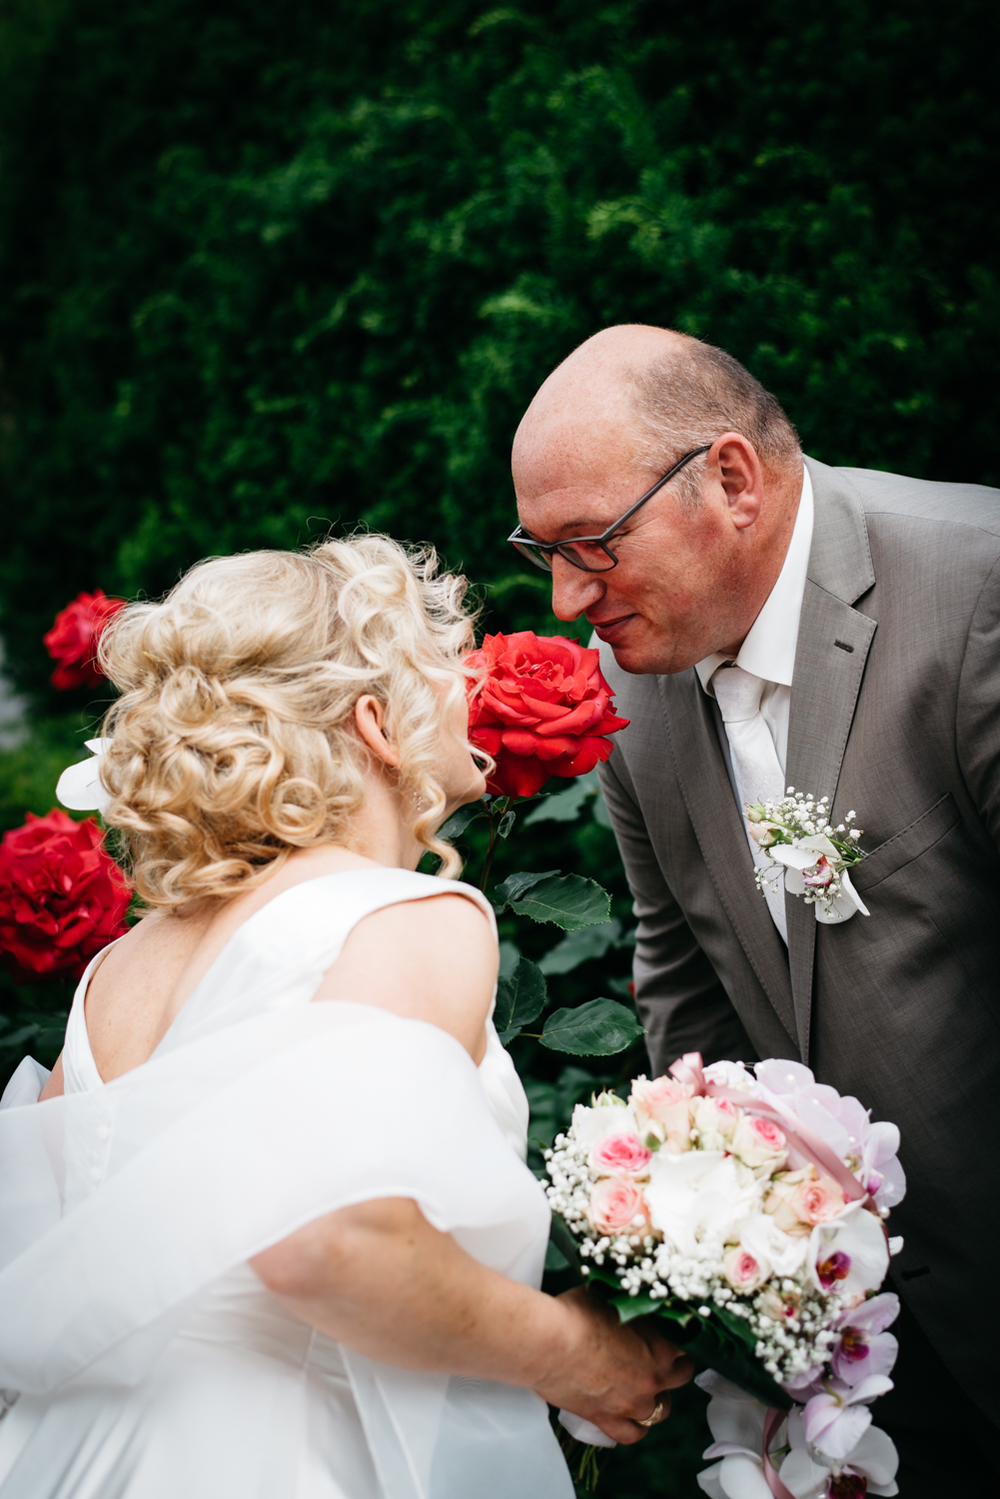 20150612 - MLDS Wedding-182.jpg